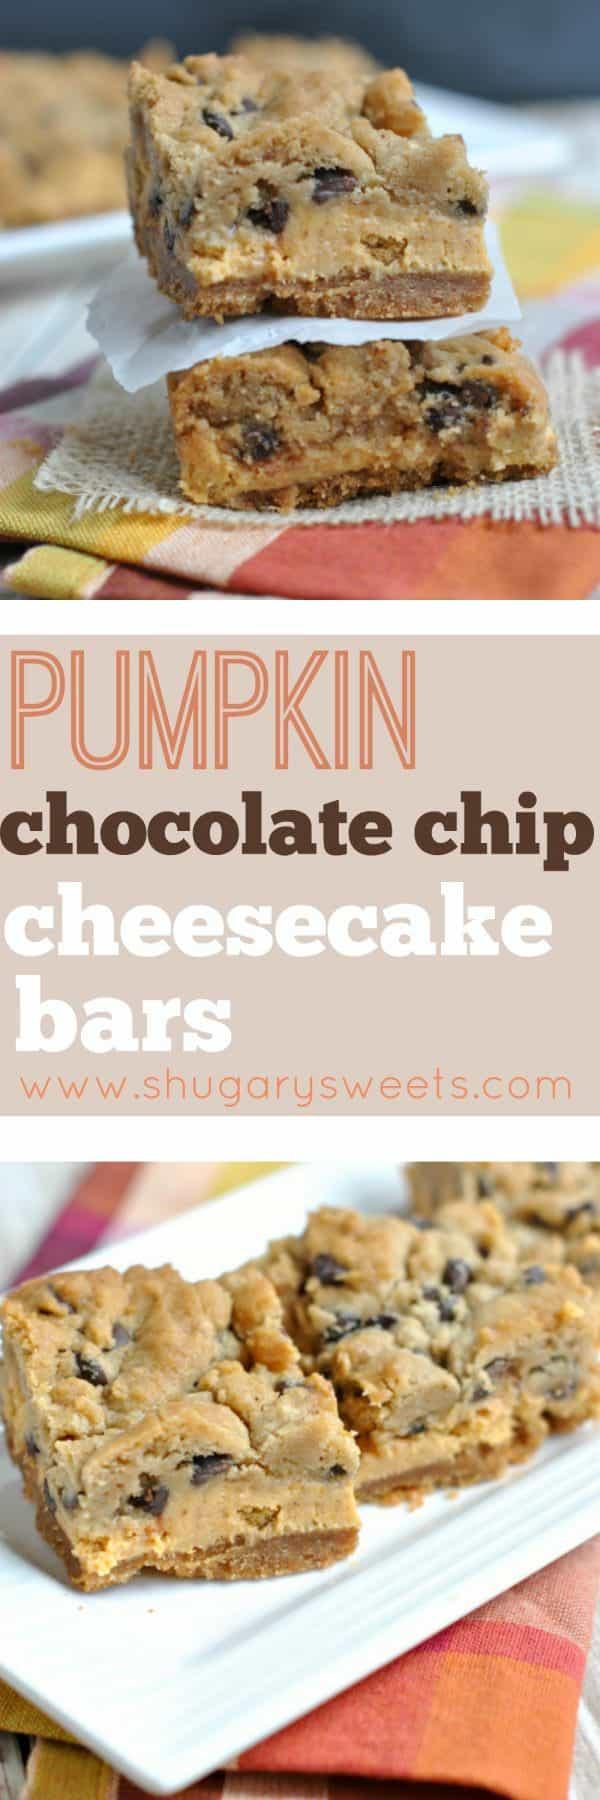 Cookie Cheesecake Bars - kolanli.com